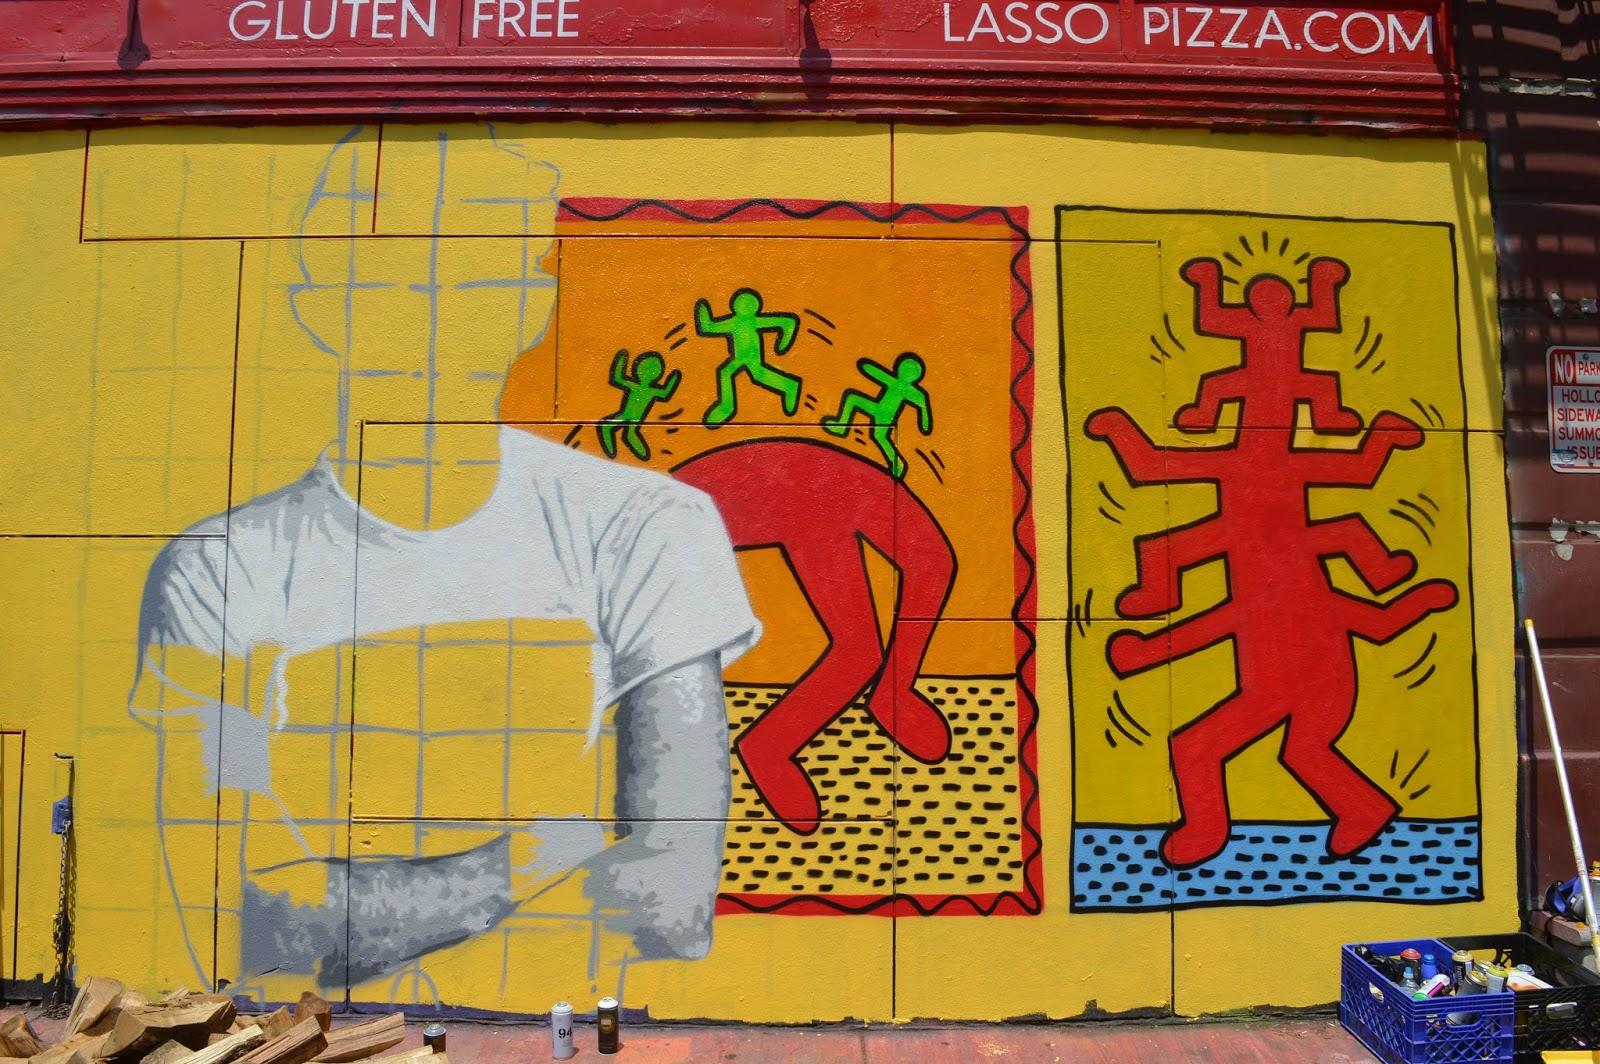 ART & FASHION SALON: Keith Haring Tribute Wall Happens in Soho!